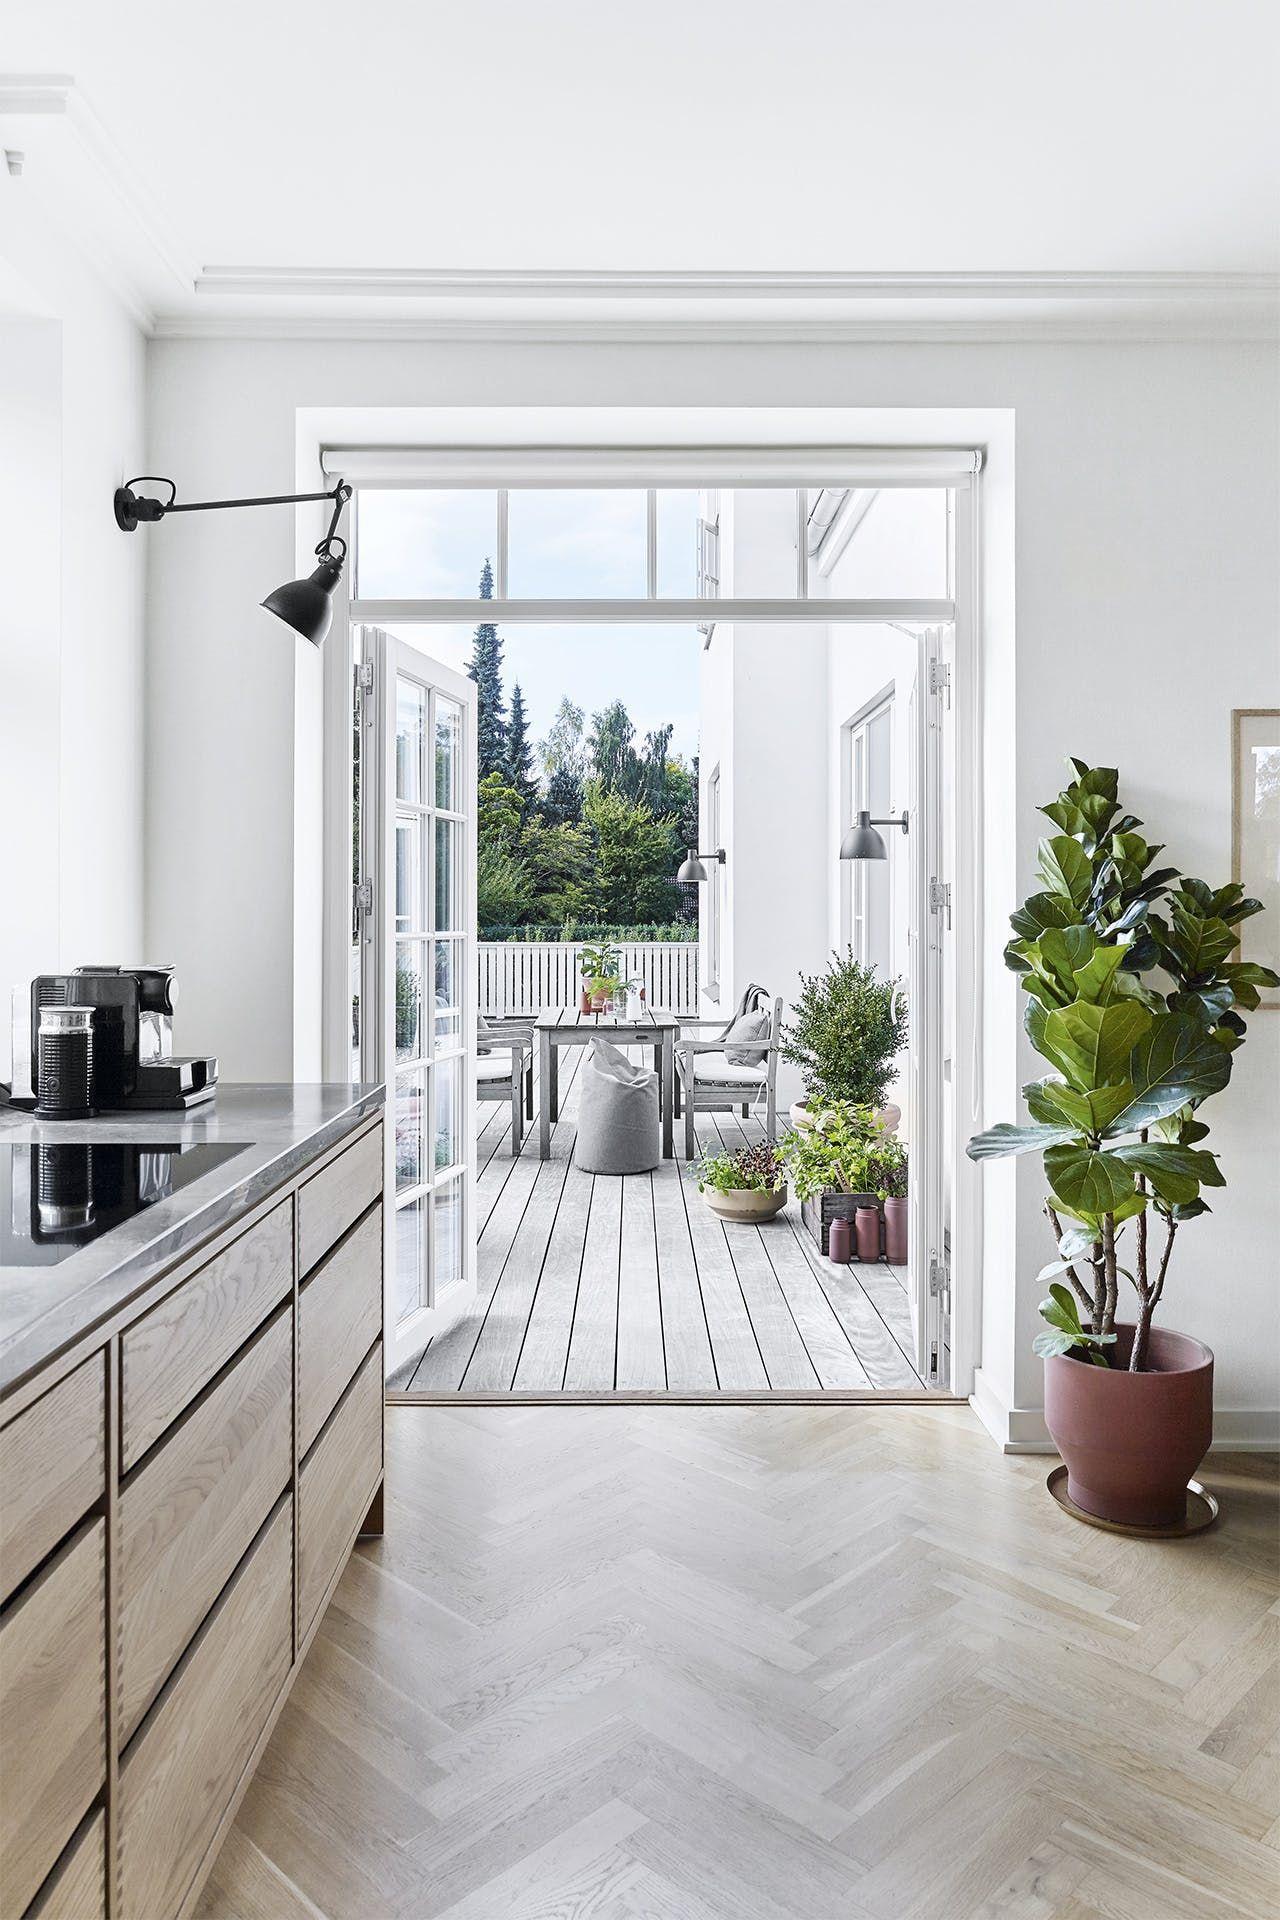 Villa Hellerup Indretning K Kken Terresse